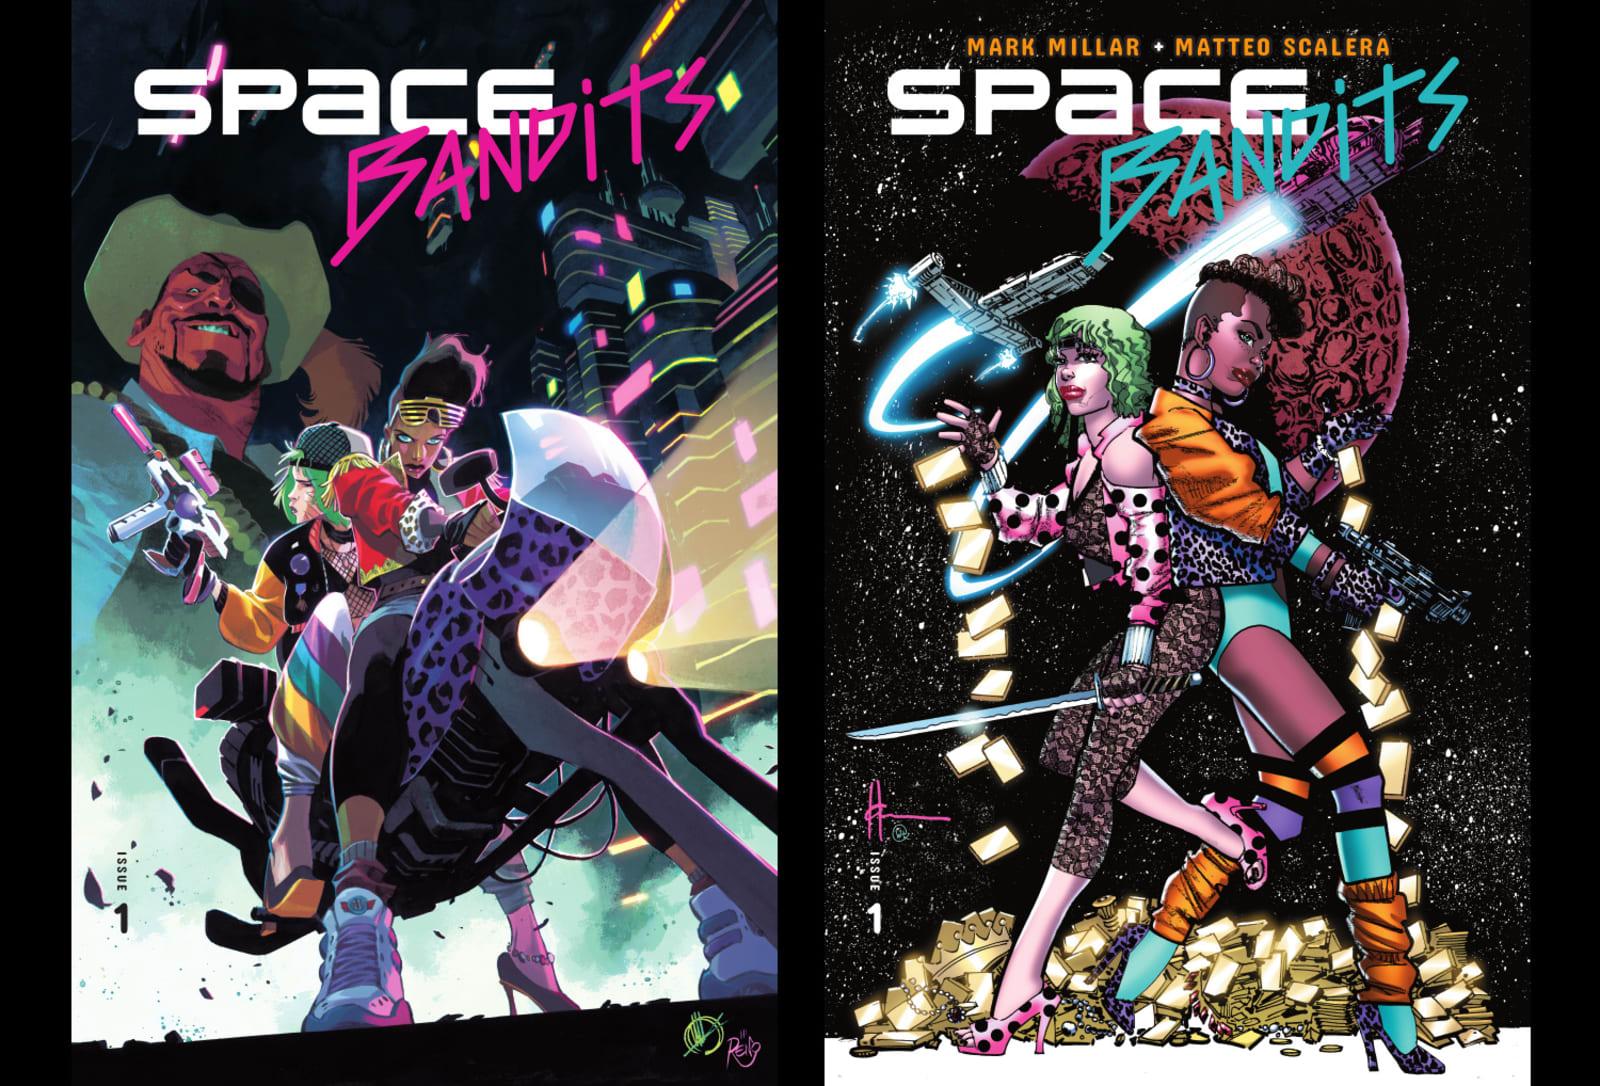 Netflix's next Mark Millar comic book is upbeat sci-fi 'Space Bandits'